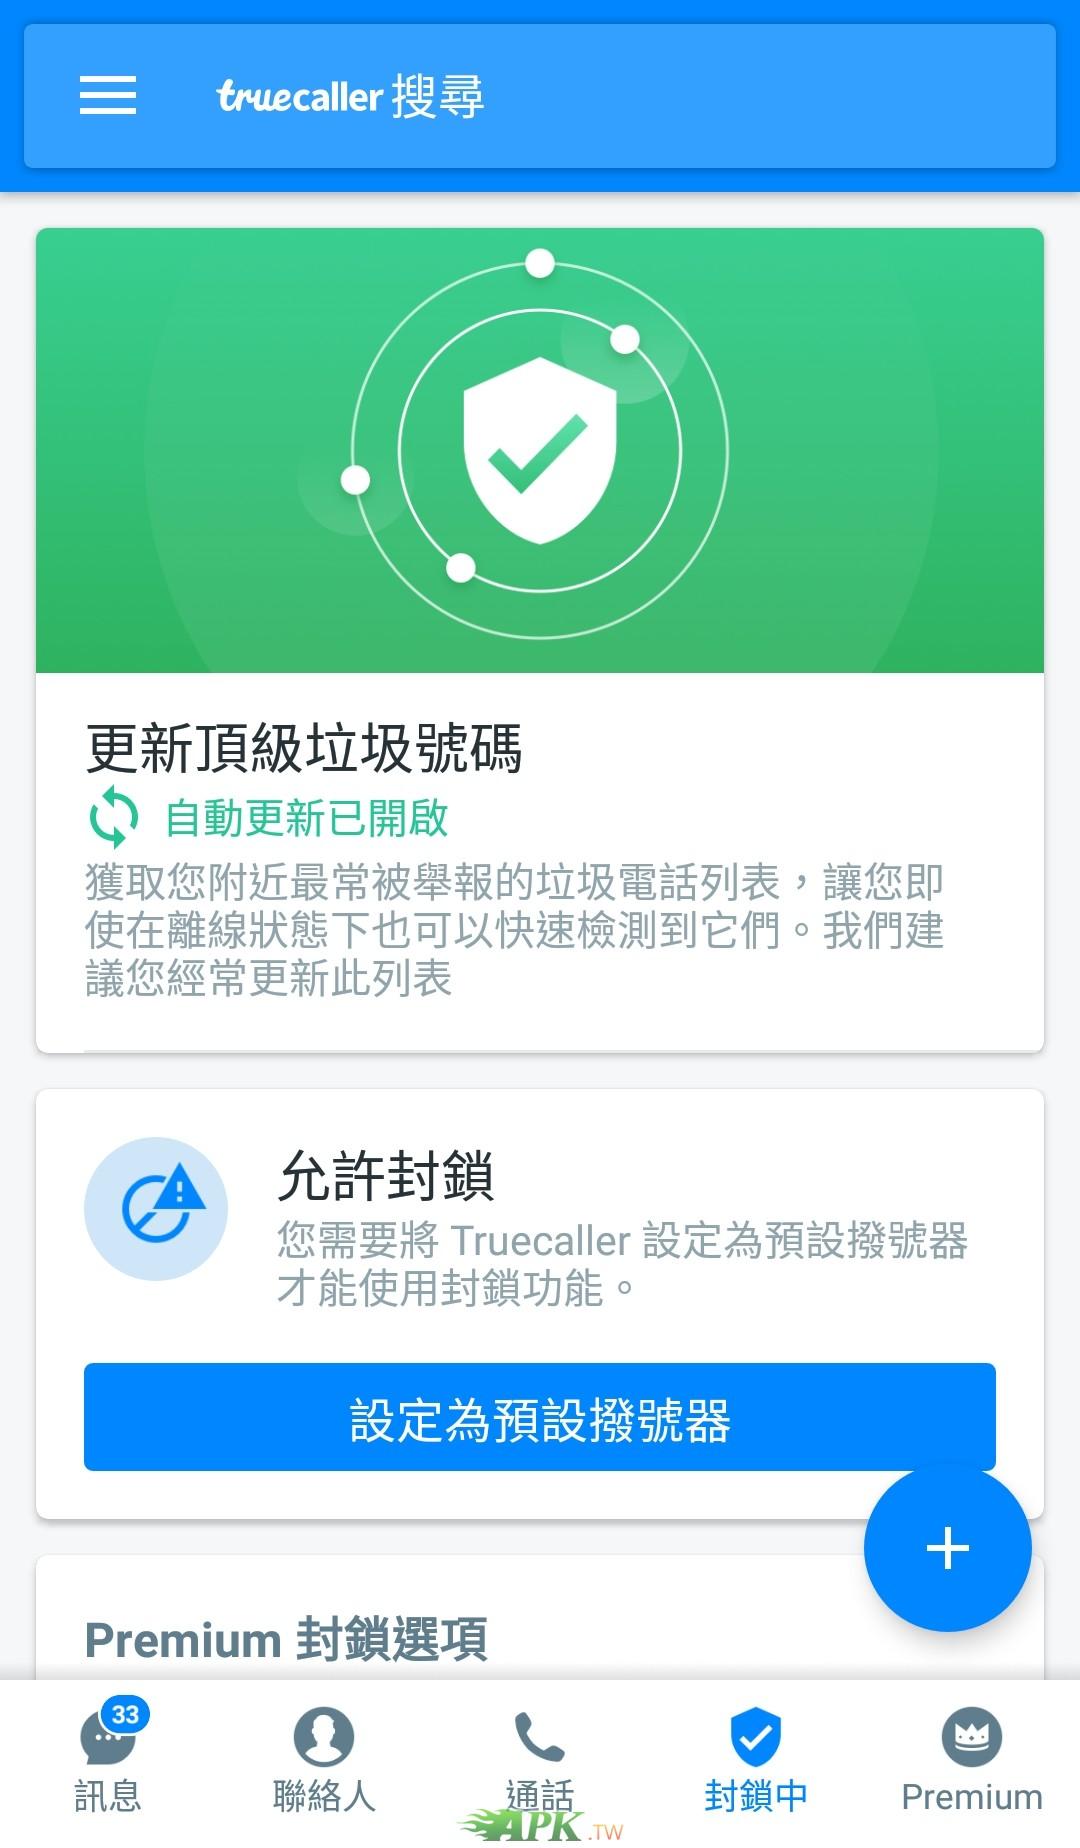 Truecaller_Premium_2.jpg